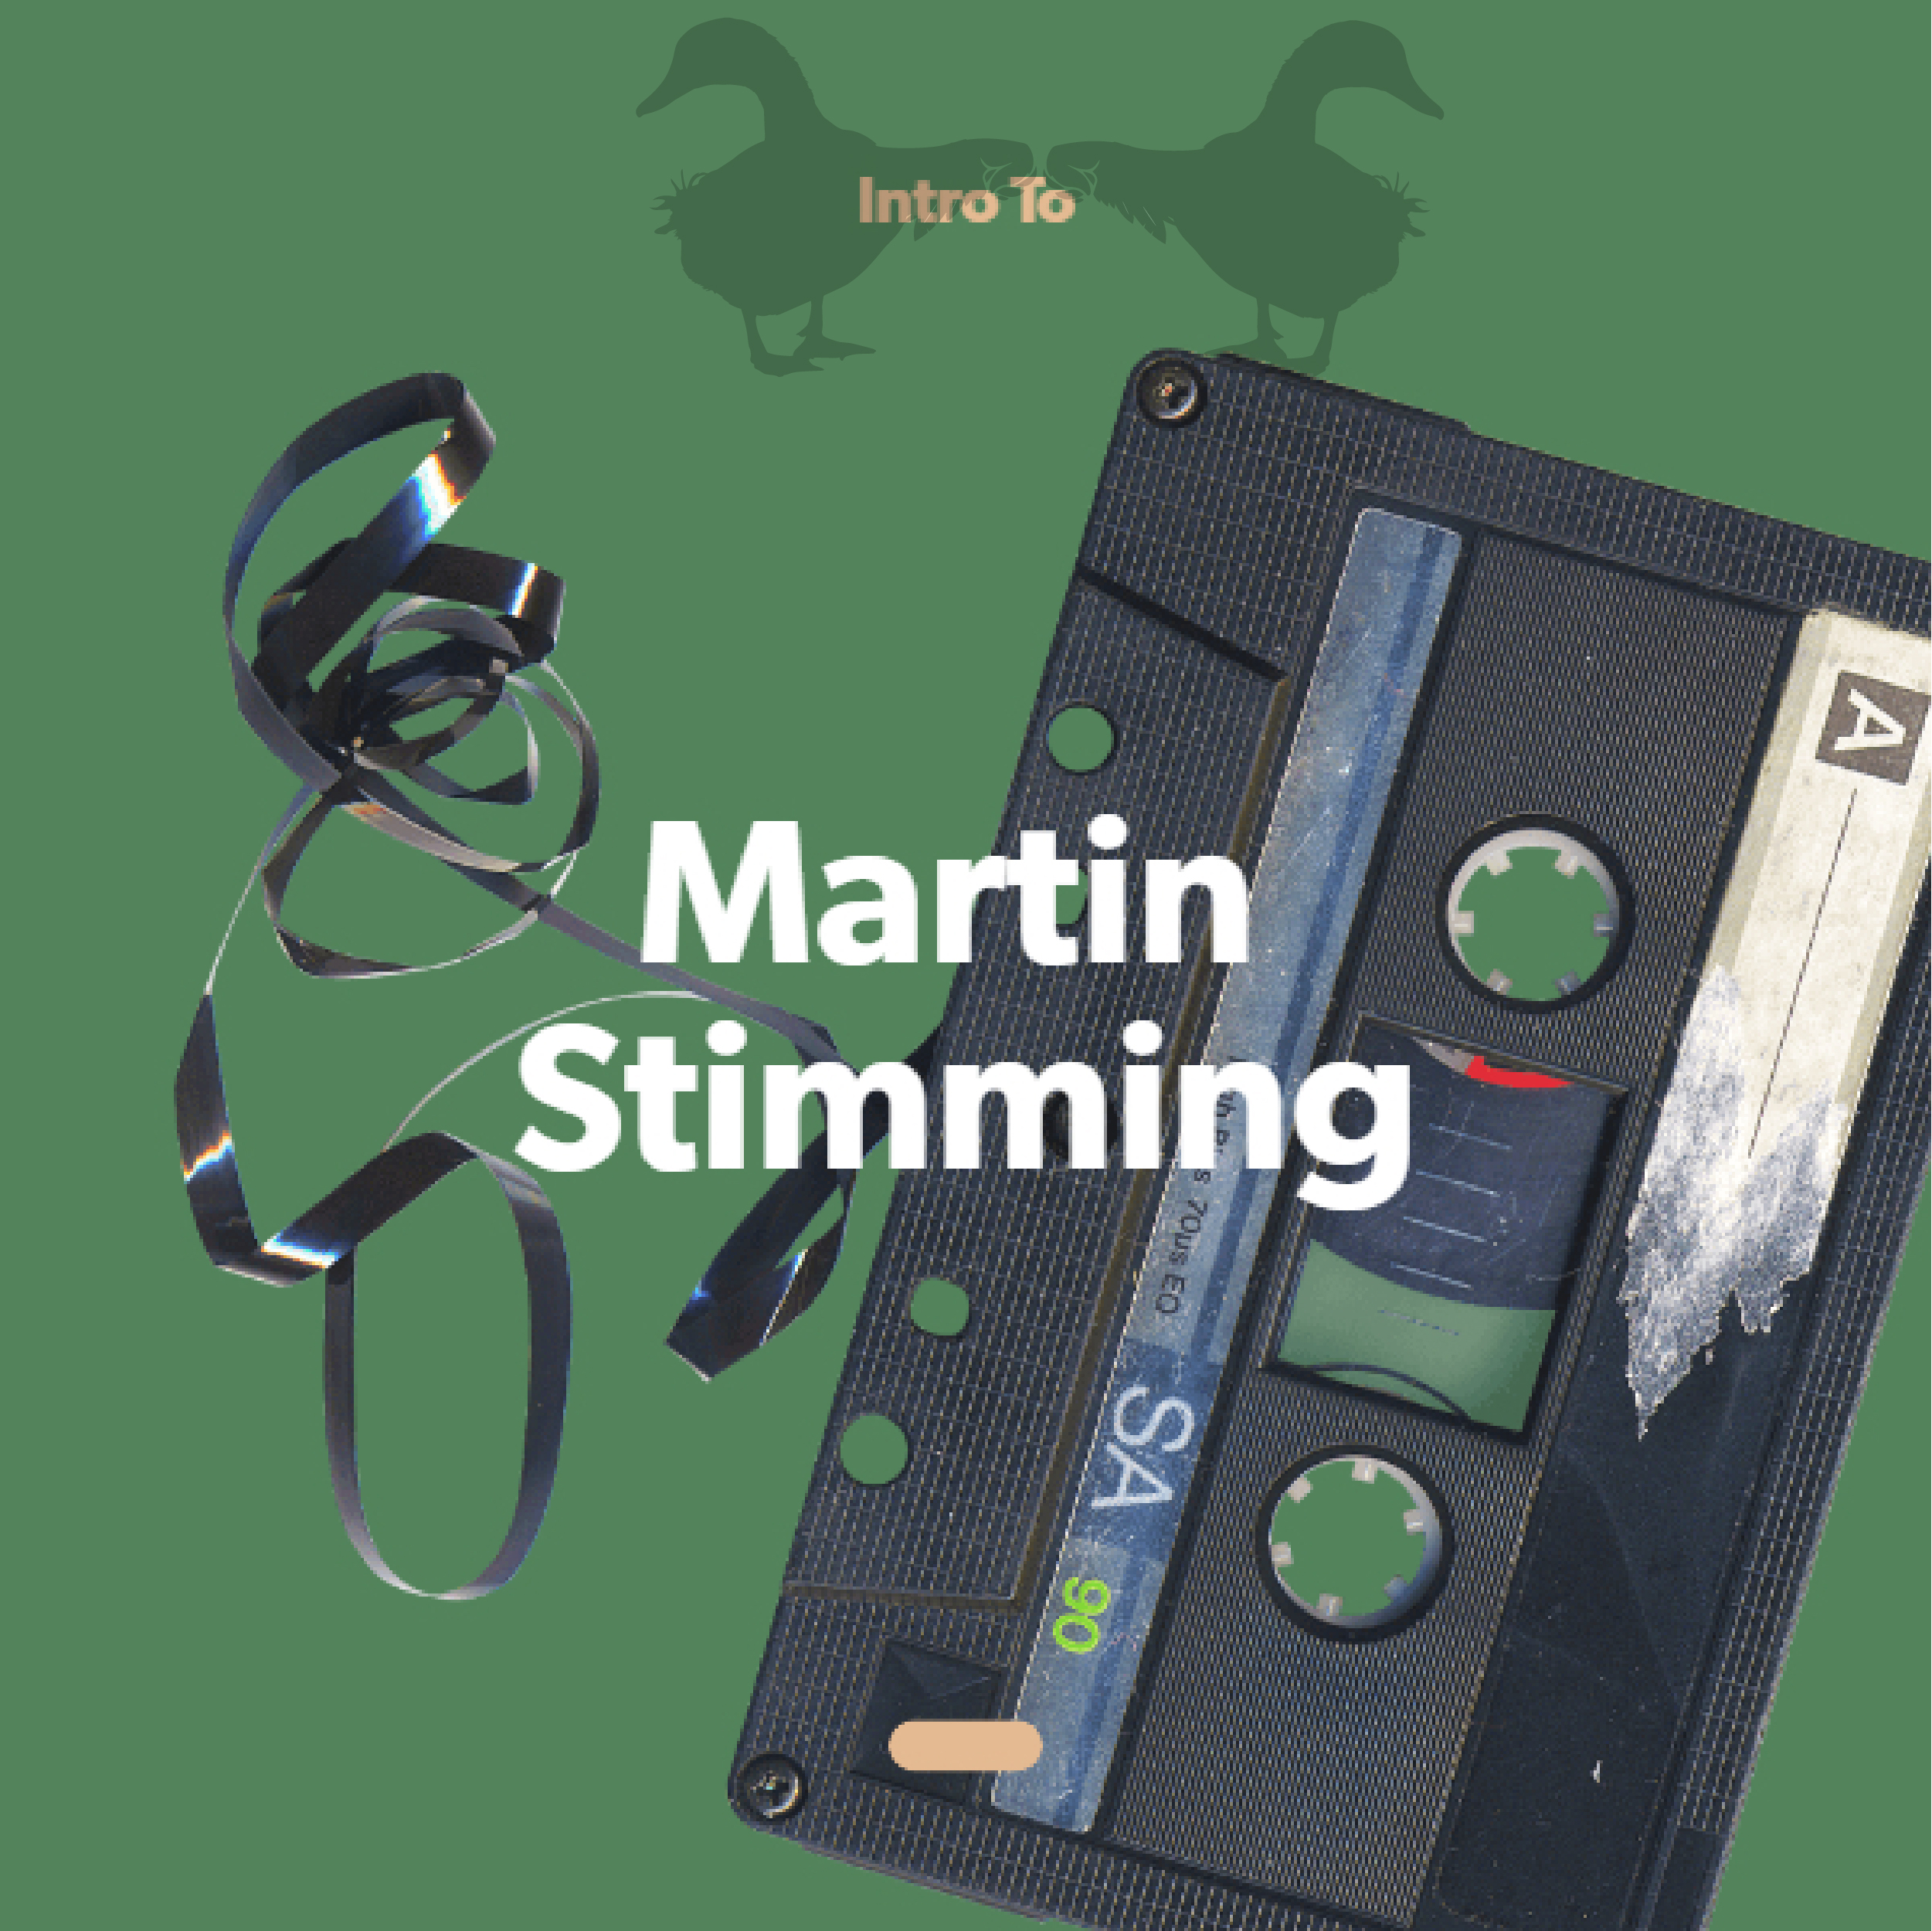 Intro to Martin Stimming Image